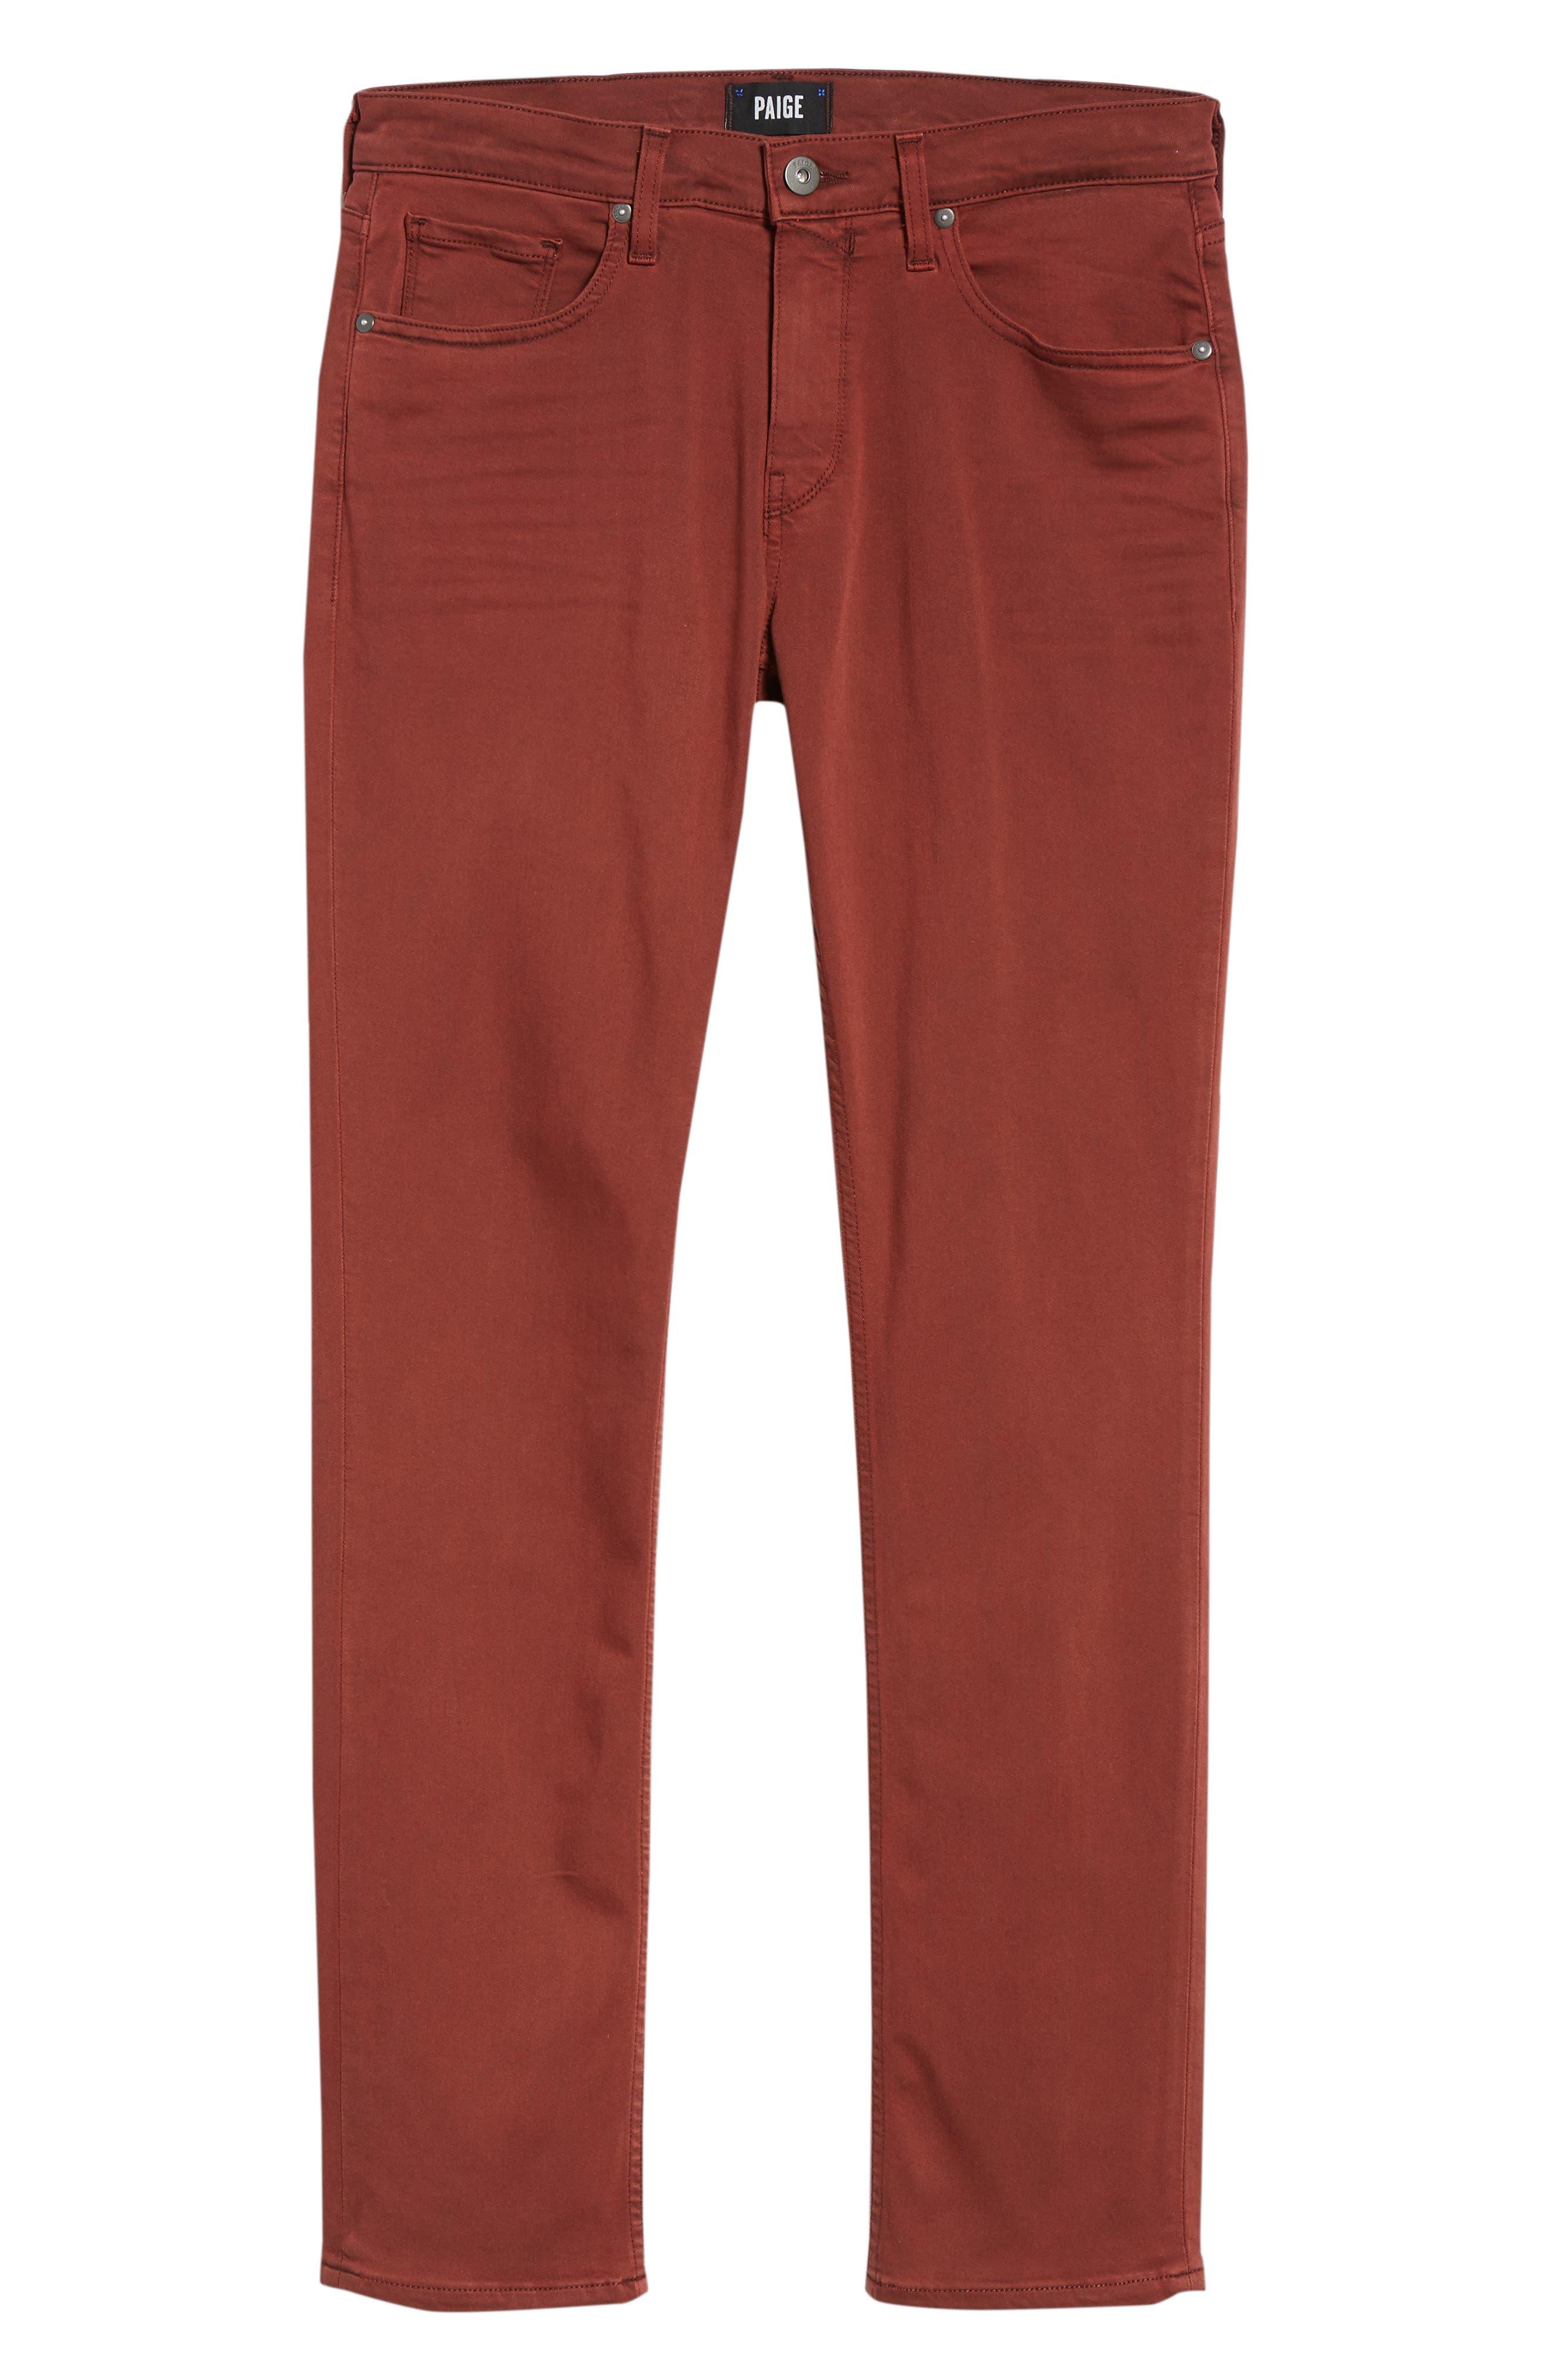 Transcend - Federal Slim Straight Leg Jeans,                             Alternate thumbnail 6, color,                             VINTAGE PERSIMMON